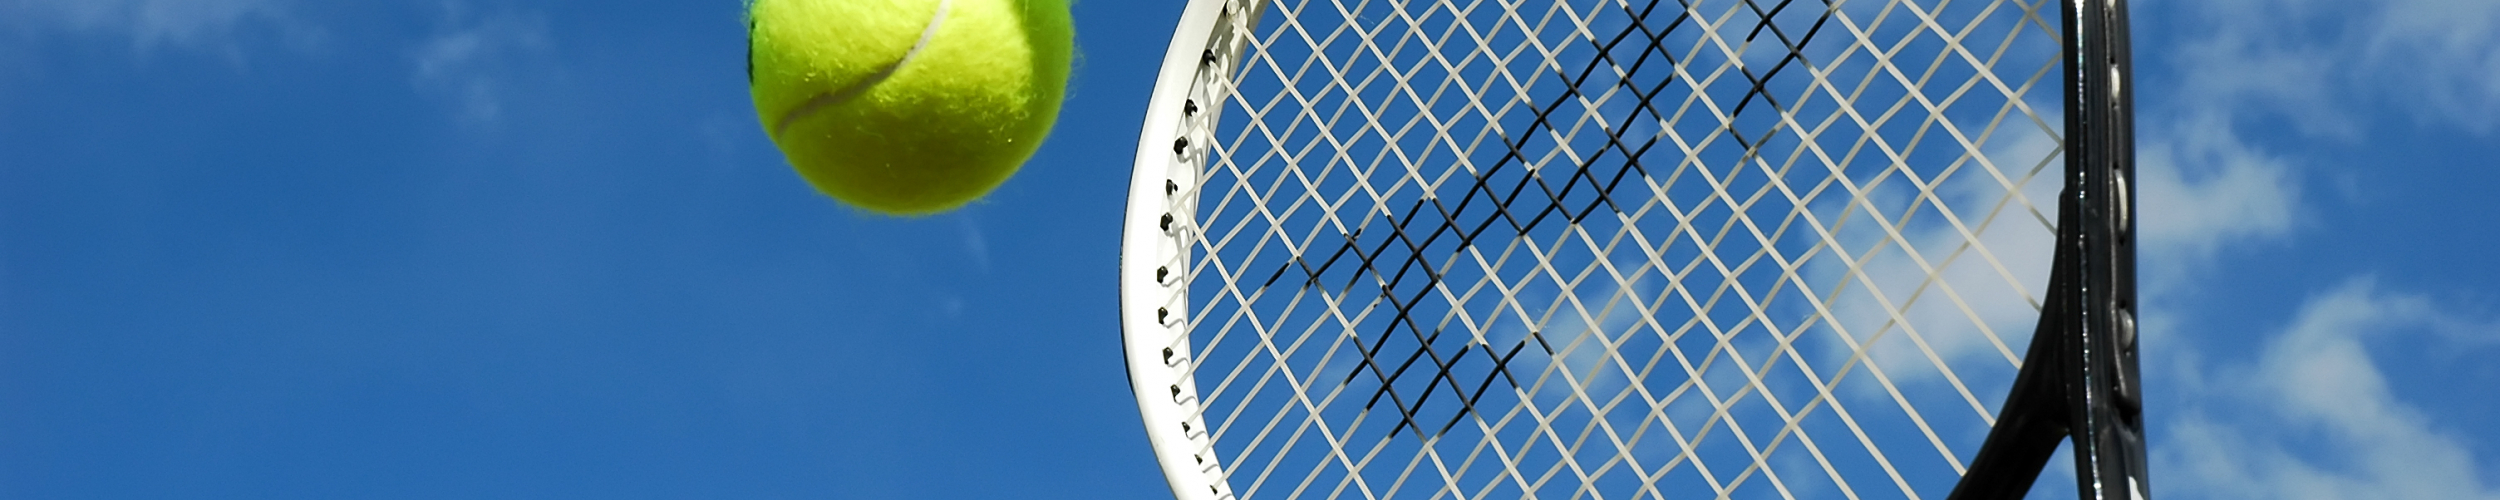 Tennisvakanties